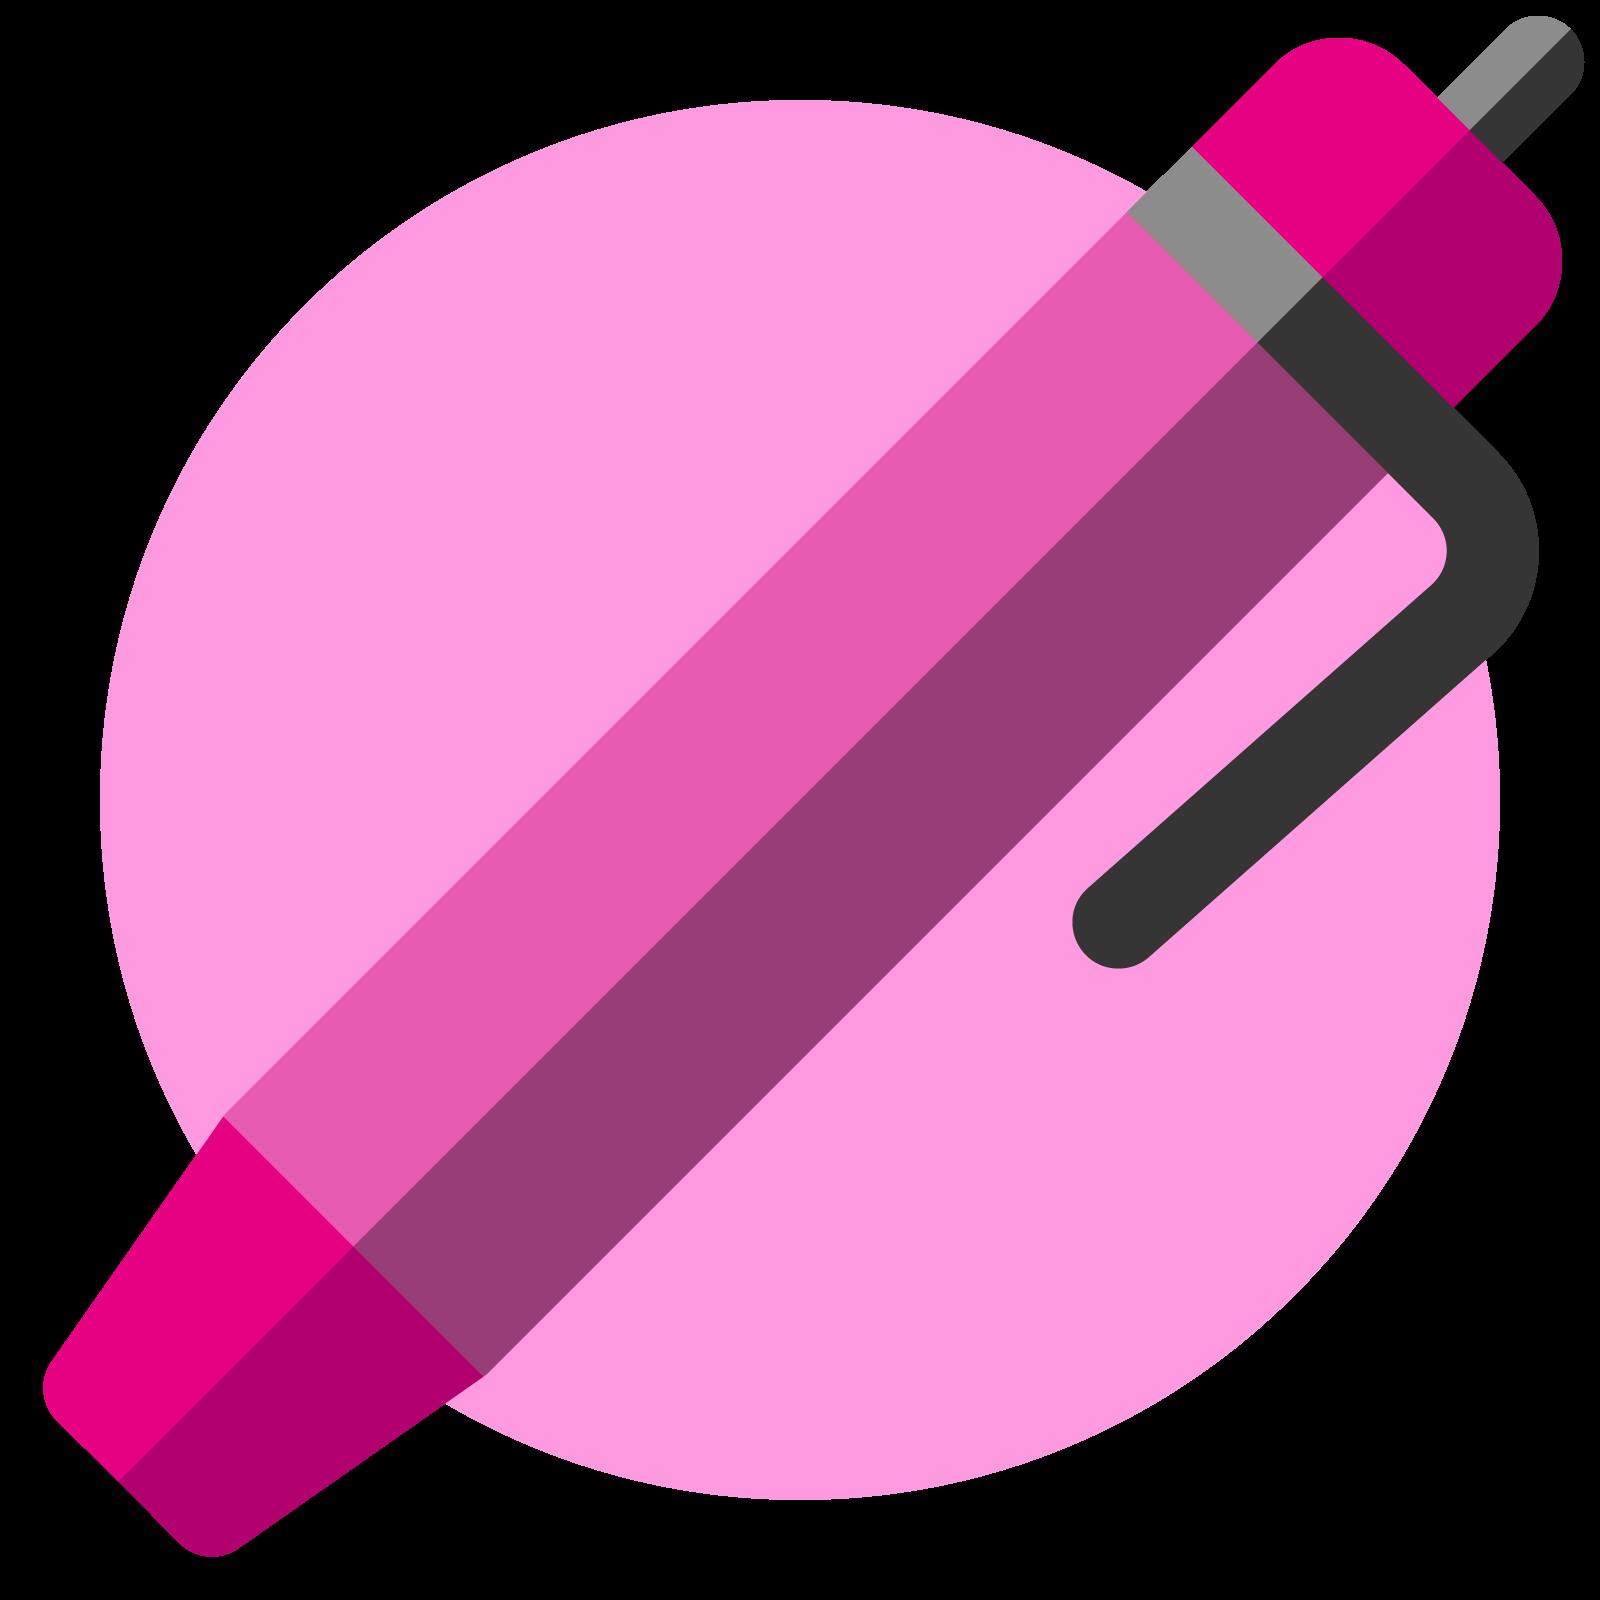 Icon of a pen